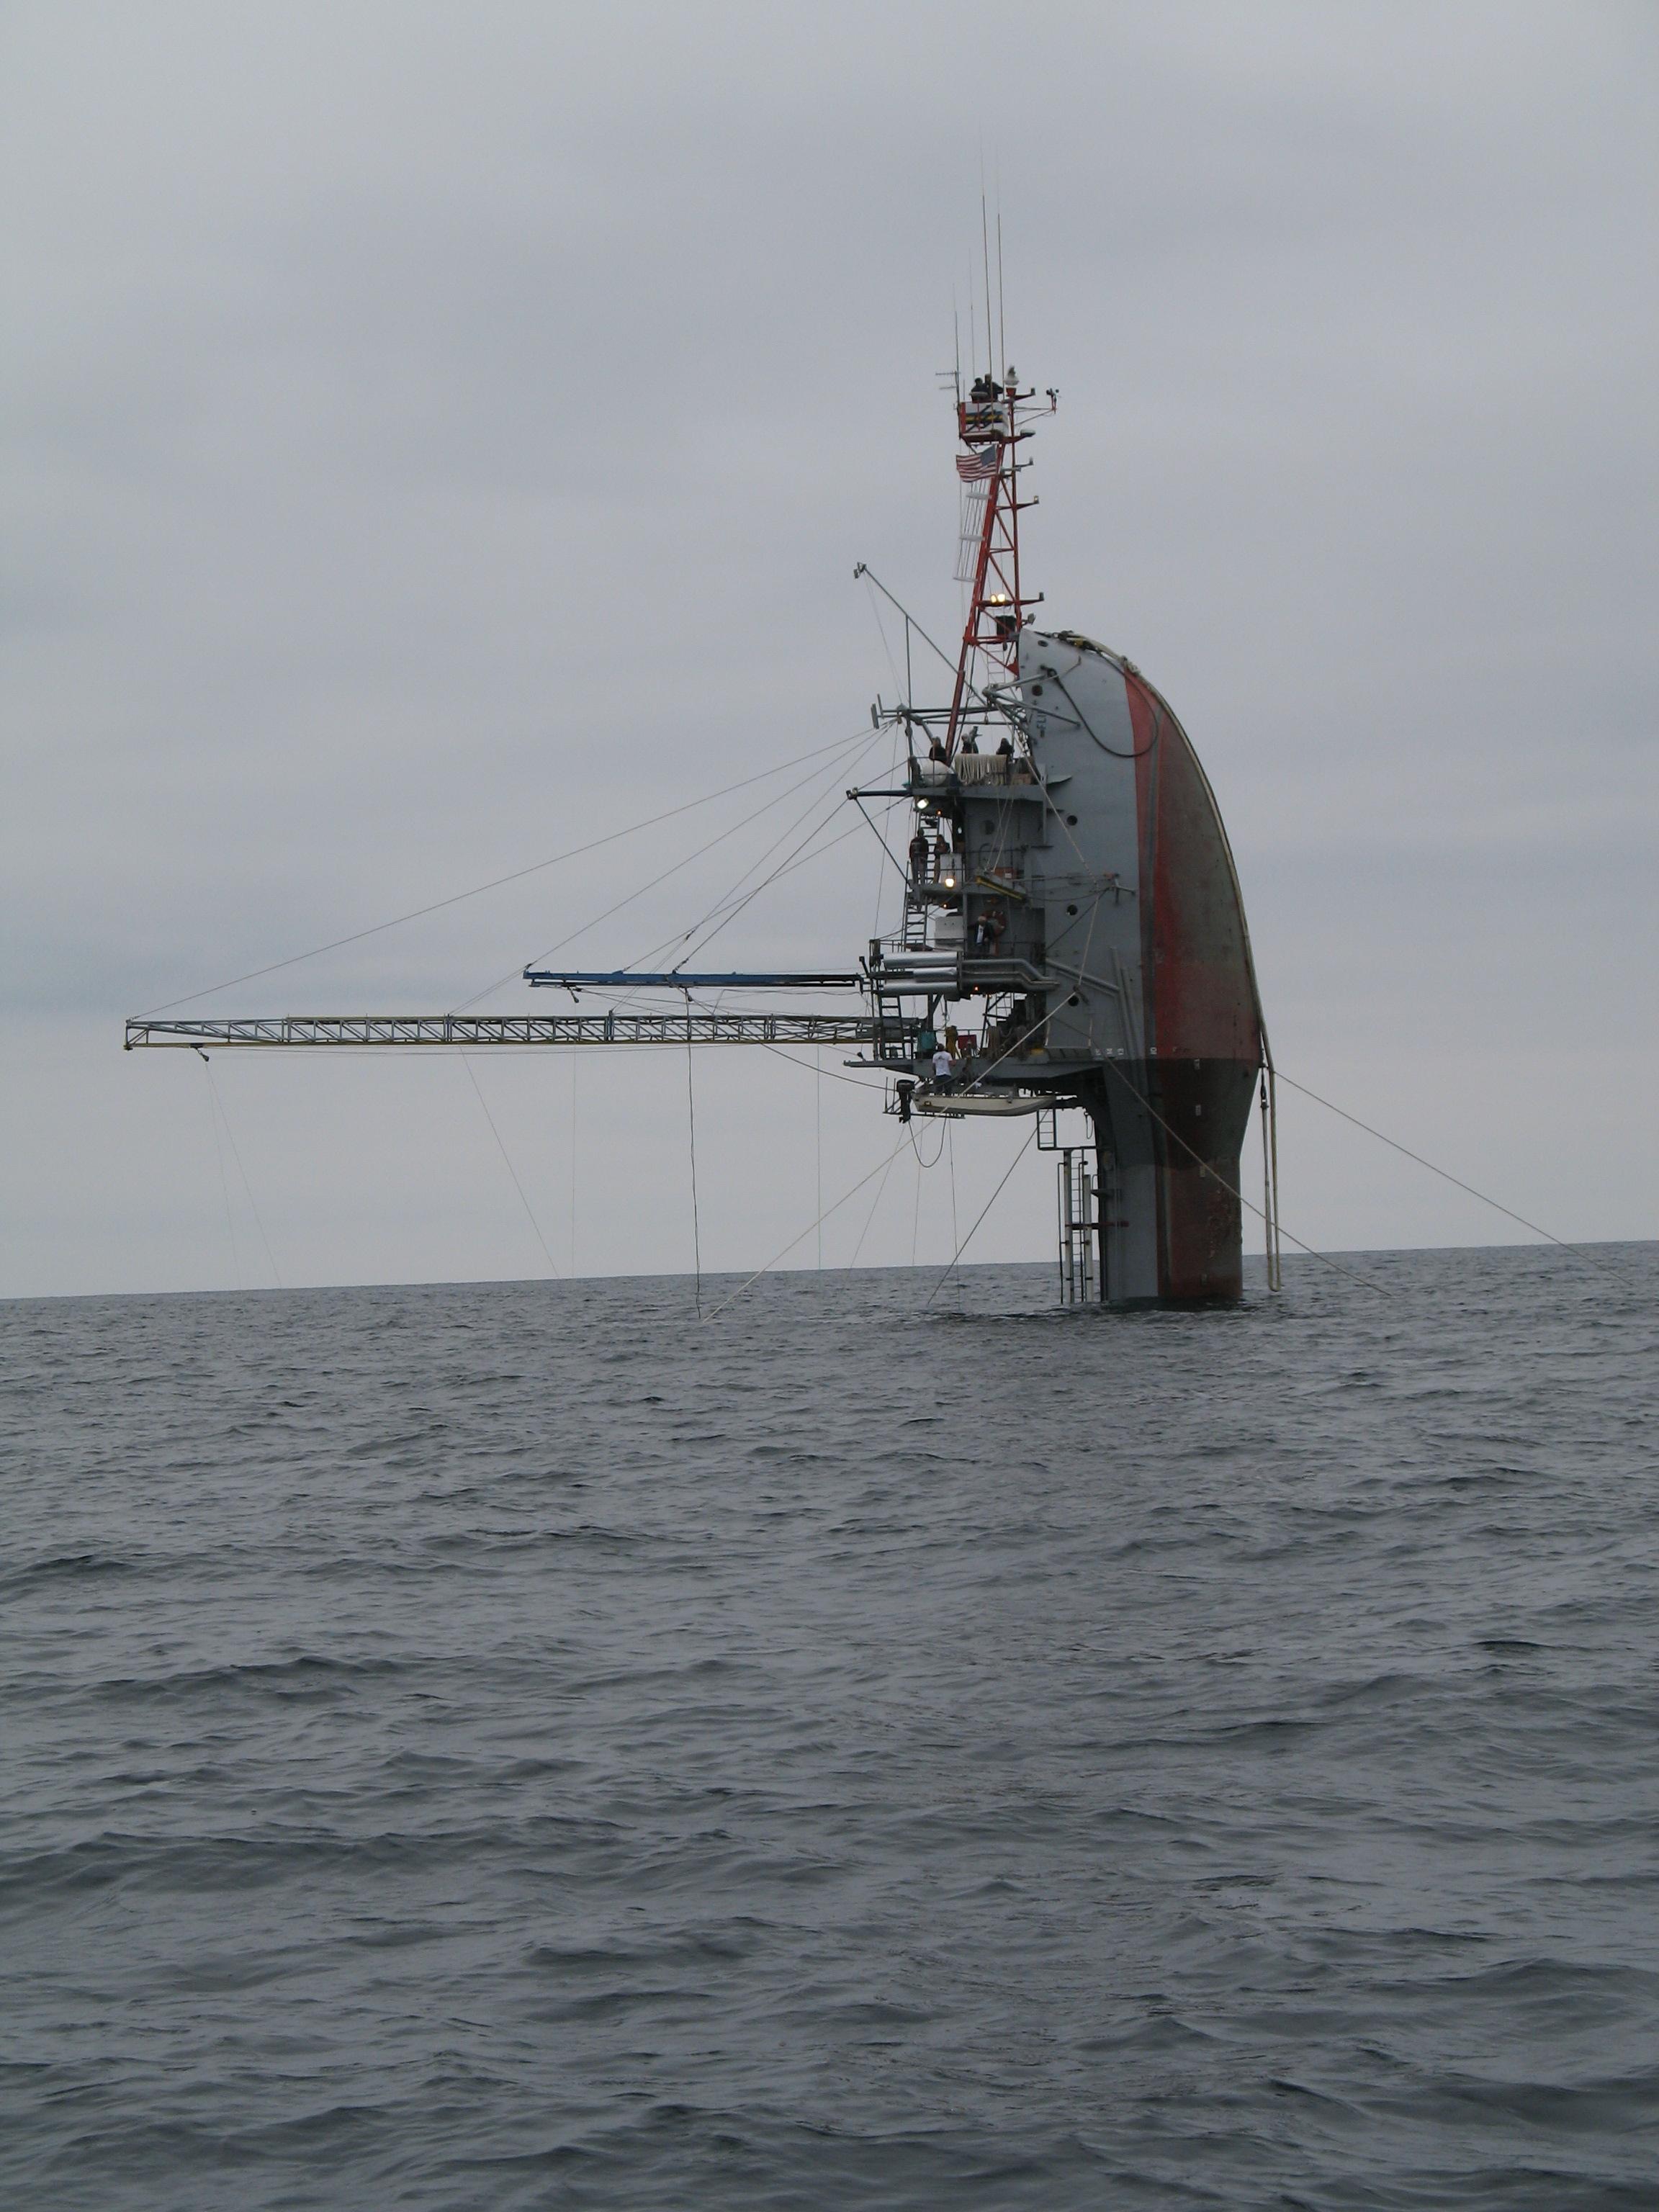 Photo: Floating Instrument Platform (FLIP)